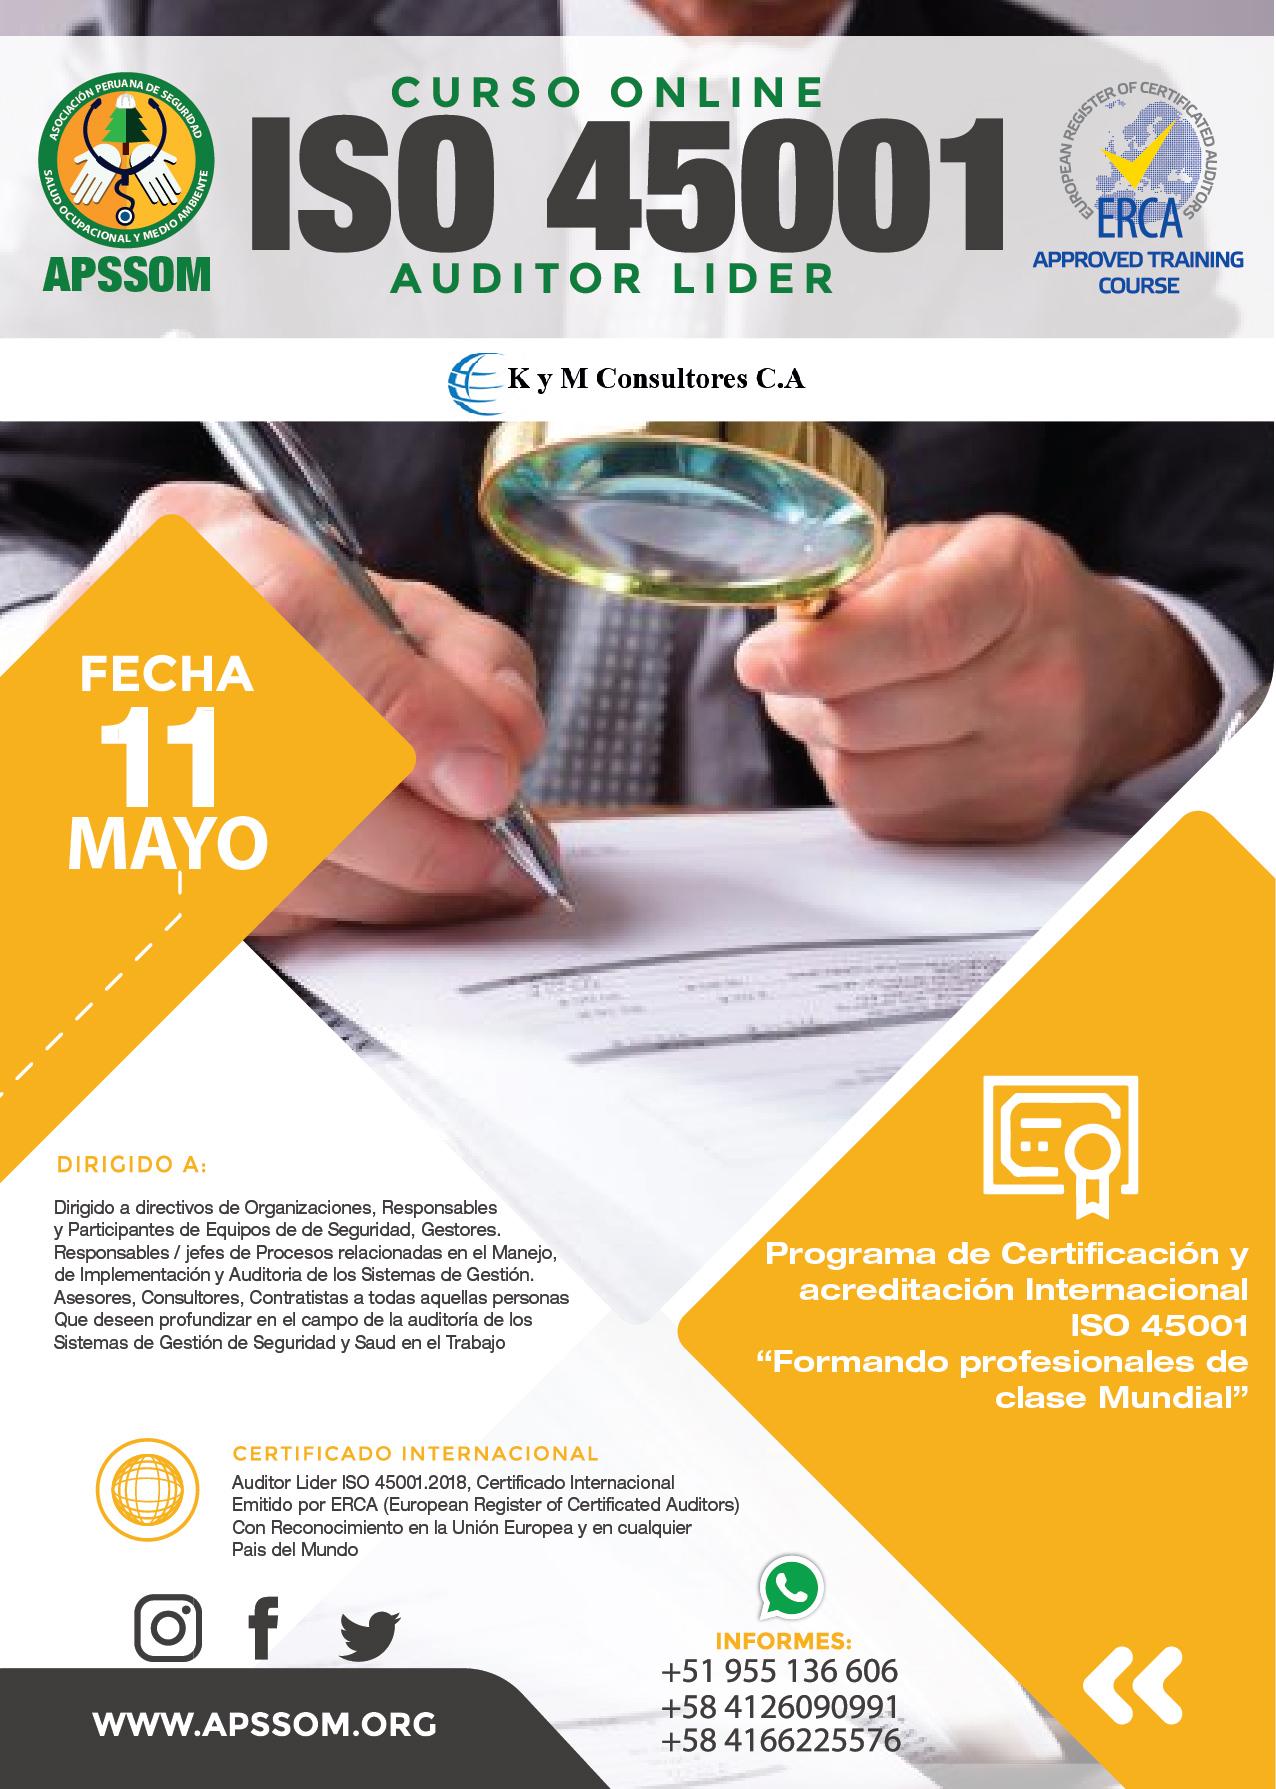 CURSO ONLINE ISO 45001 AUDITOR LÍDER ERCA